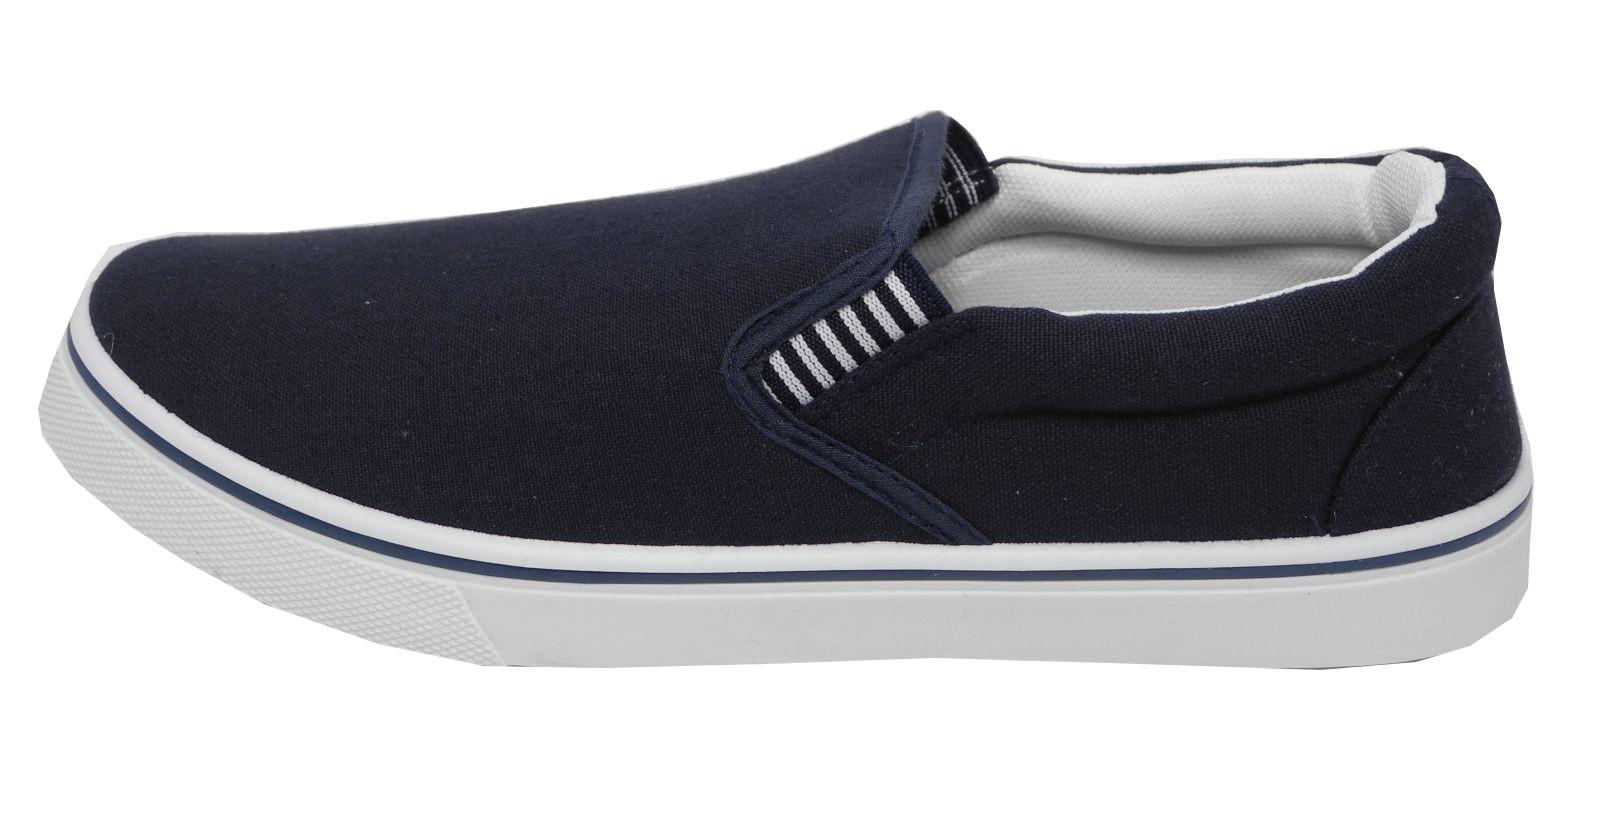 Mens Canvas Slip On Shoe Size